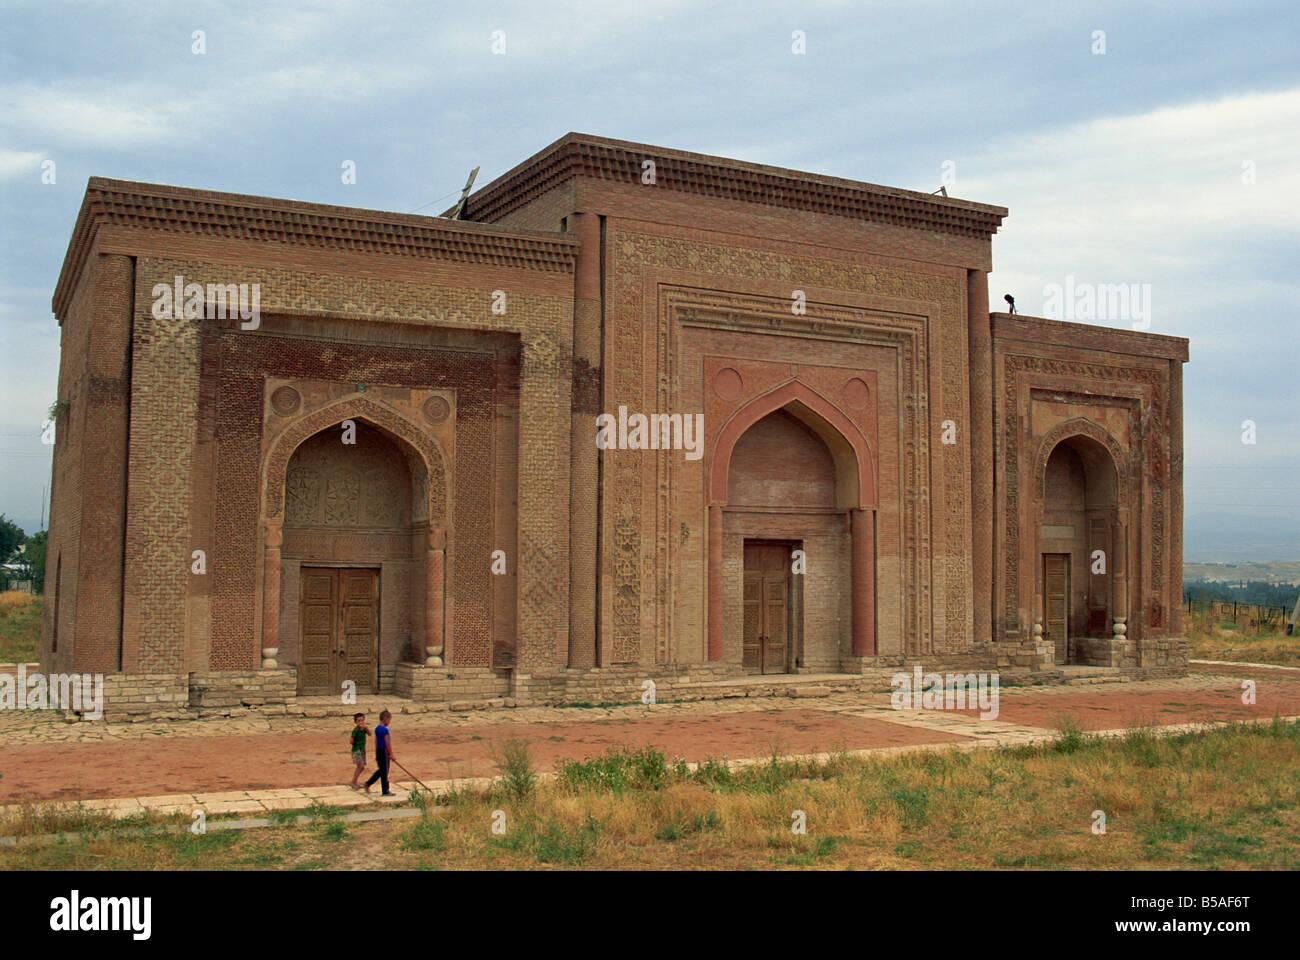 The 11th century Karakhanid mausoleum, Uzgen, Kyrgyzstan, Central Asia - Stock Image